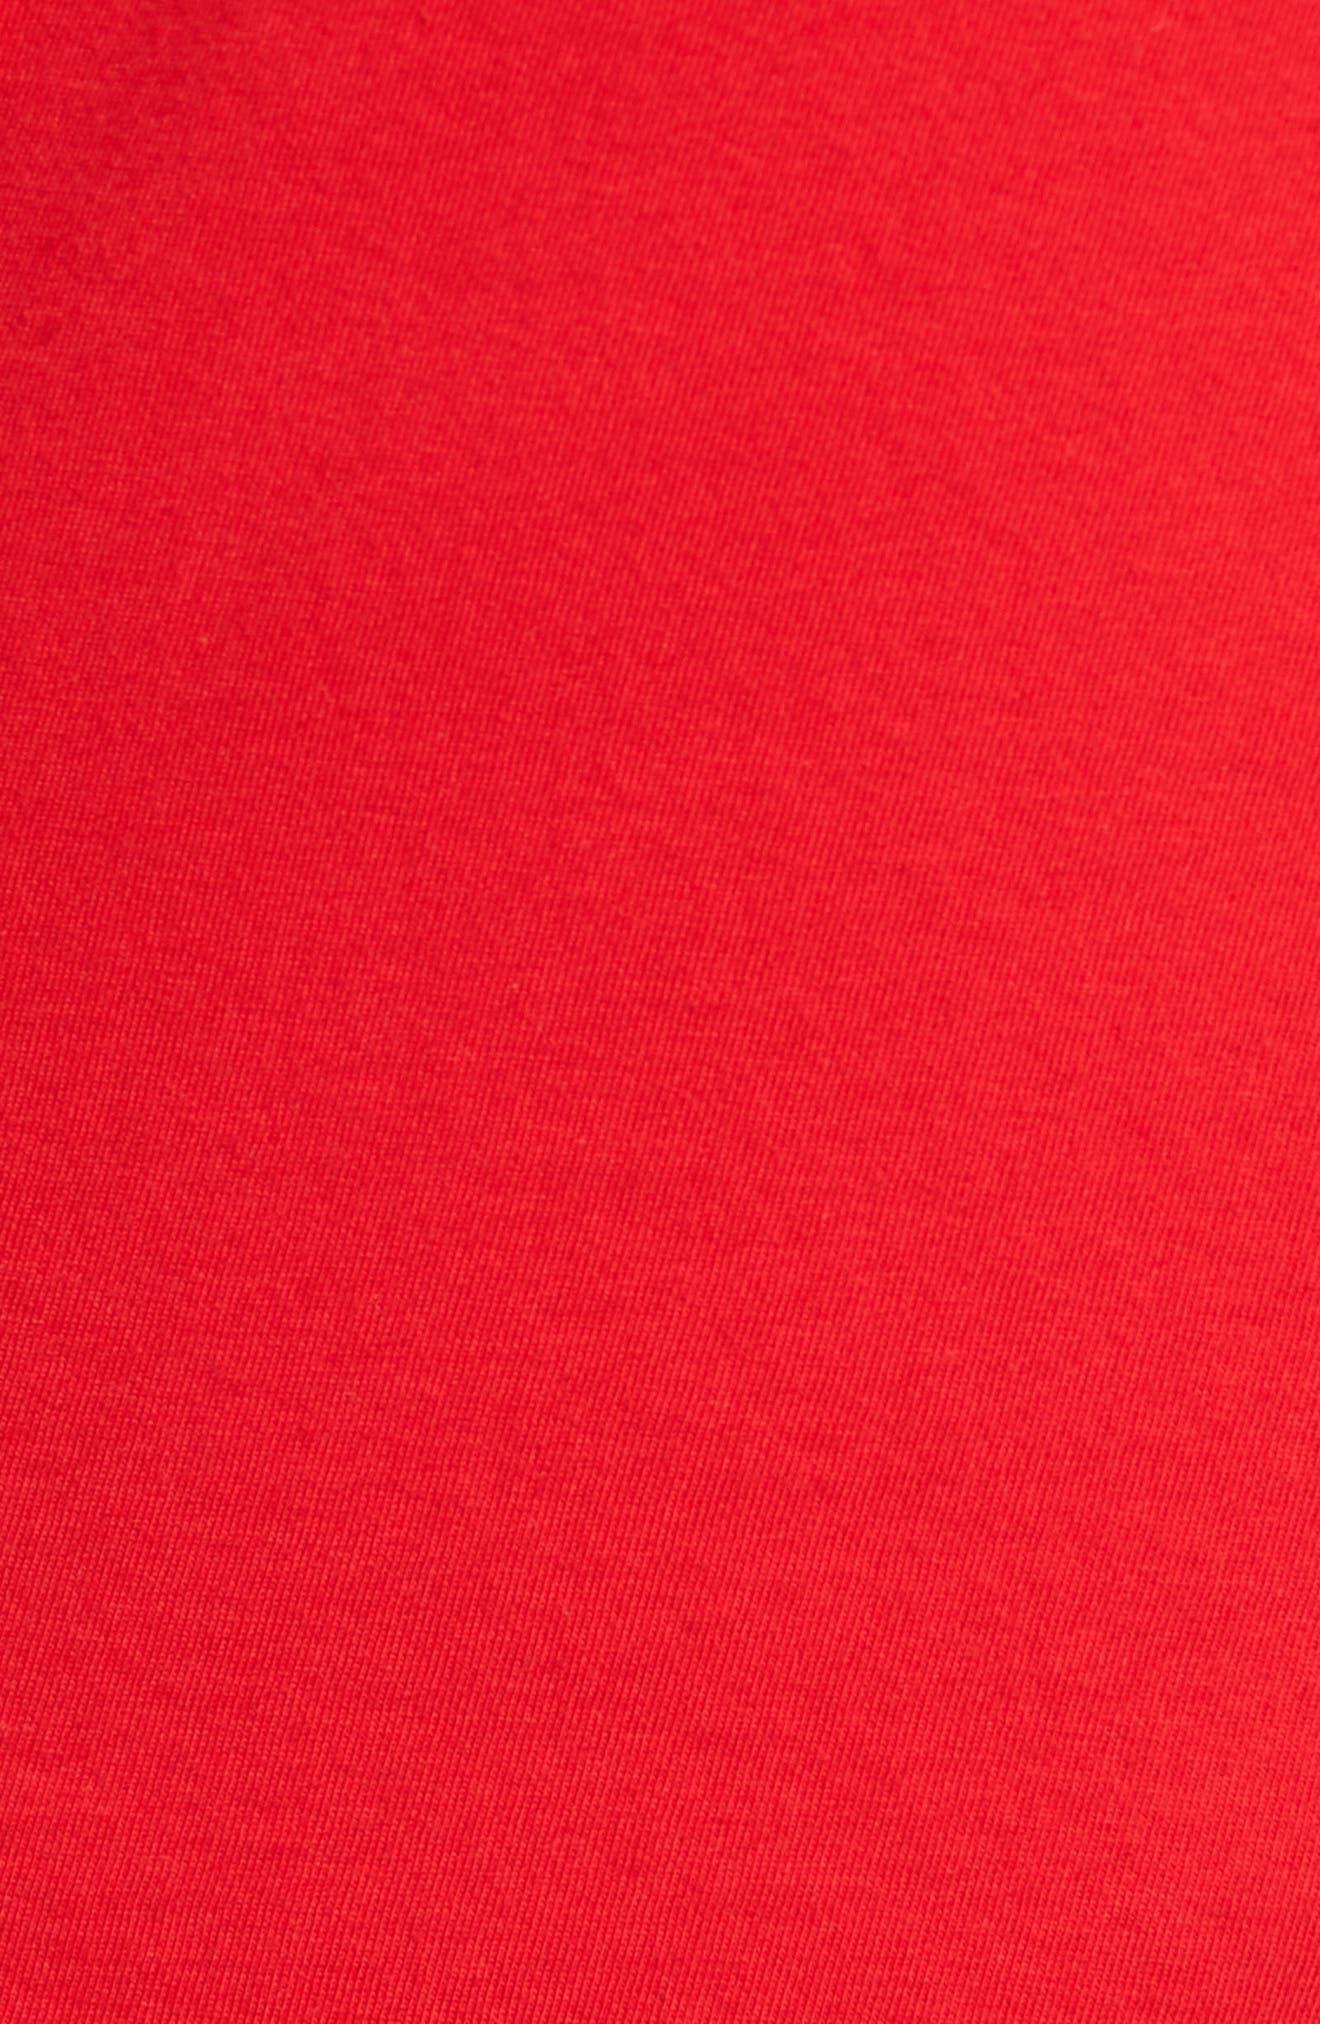 Stay Woke T-Shirt,                             Alternate thumbnail 5, color,                             Red Stay Woke